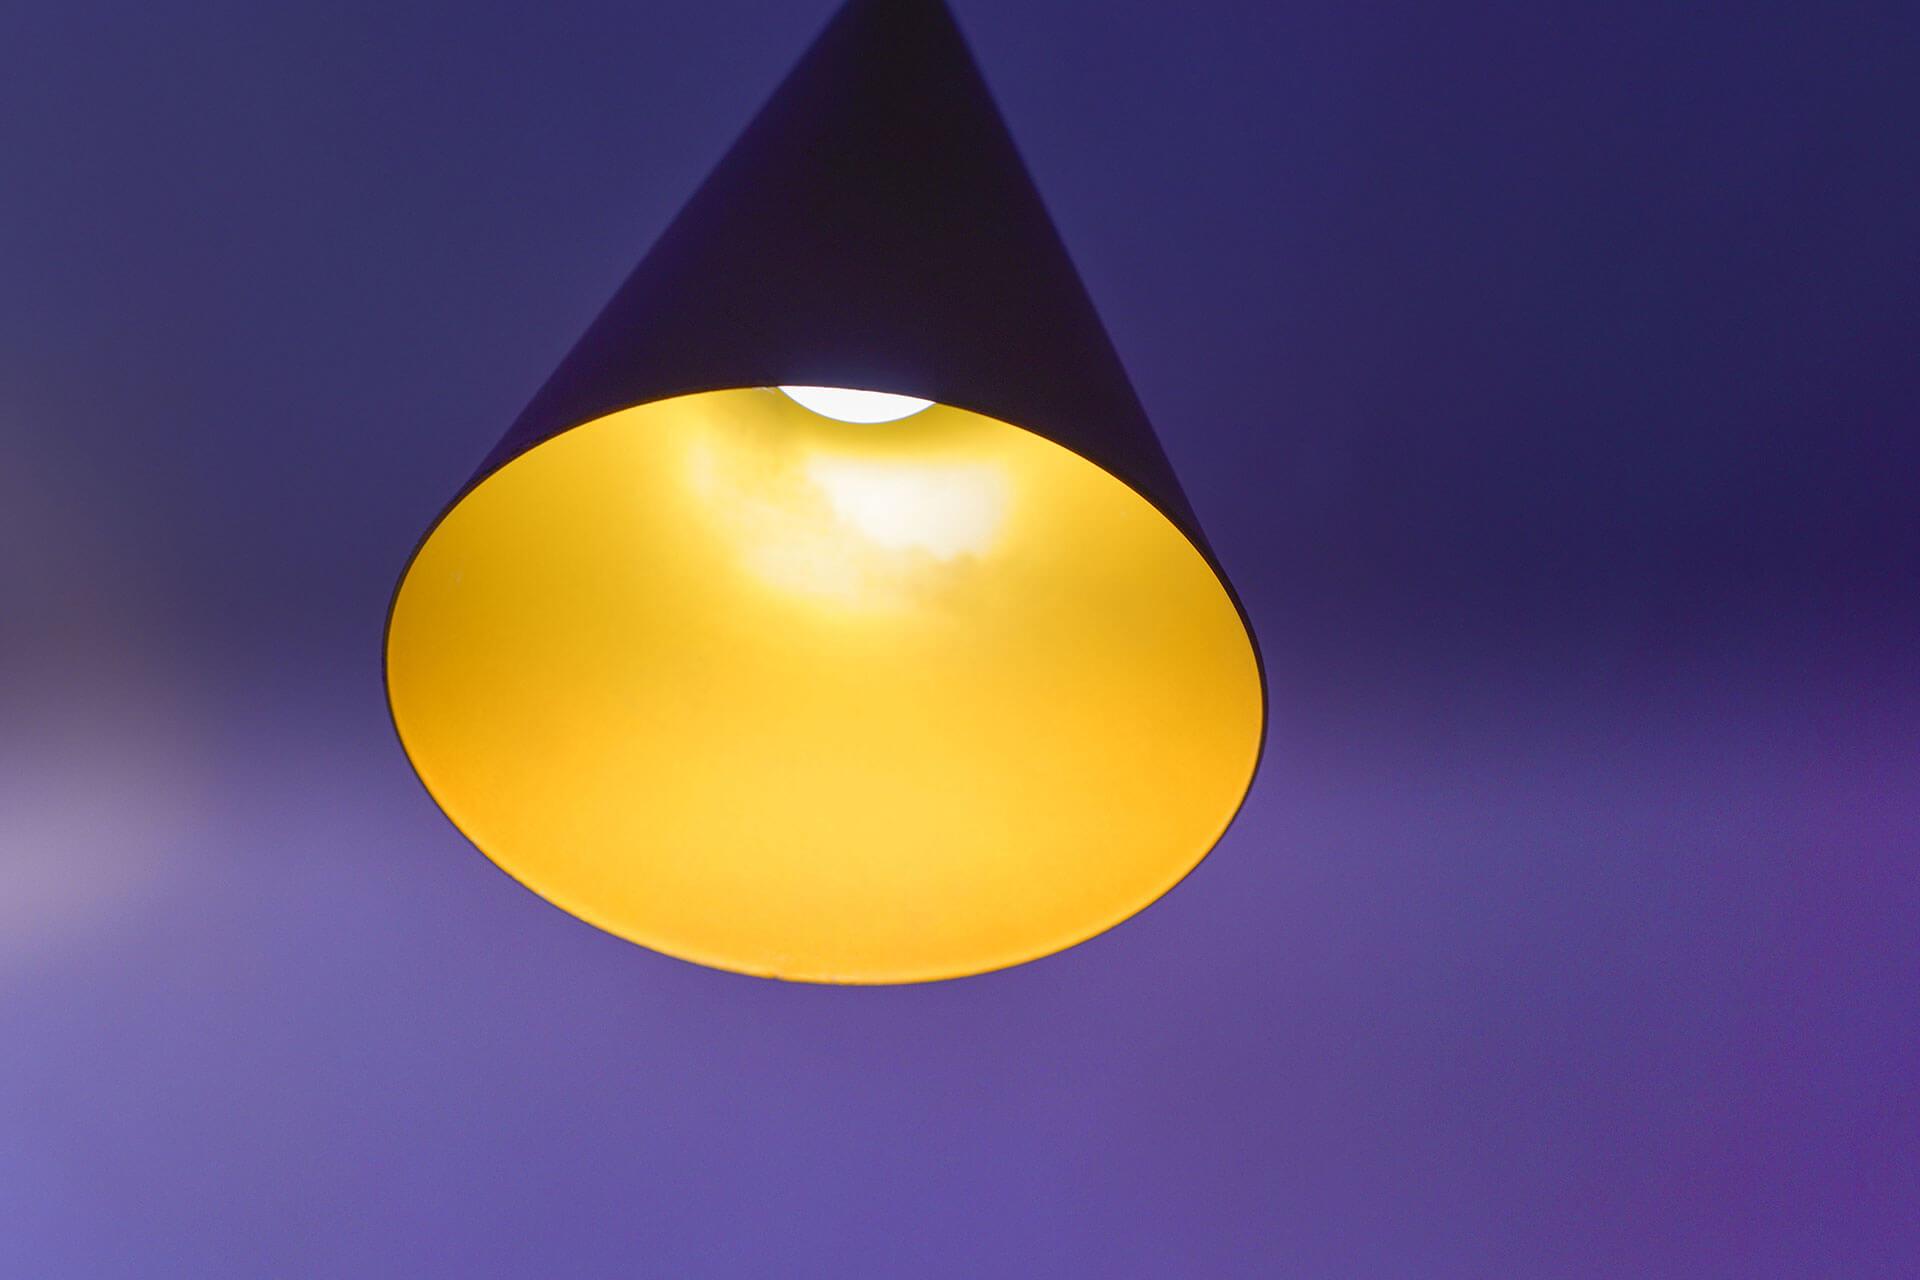 Lightbox Image 5